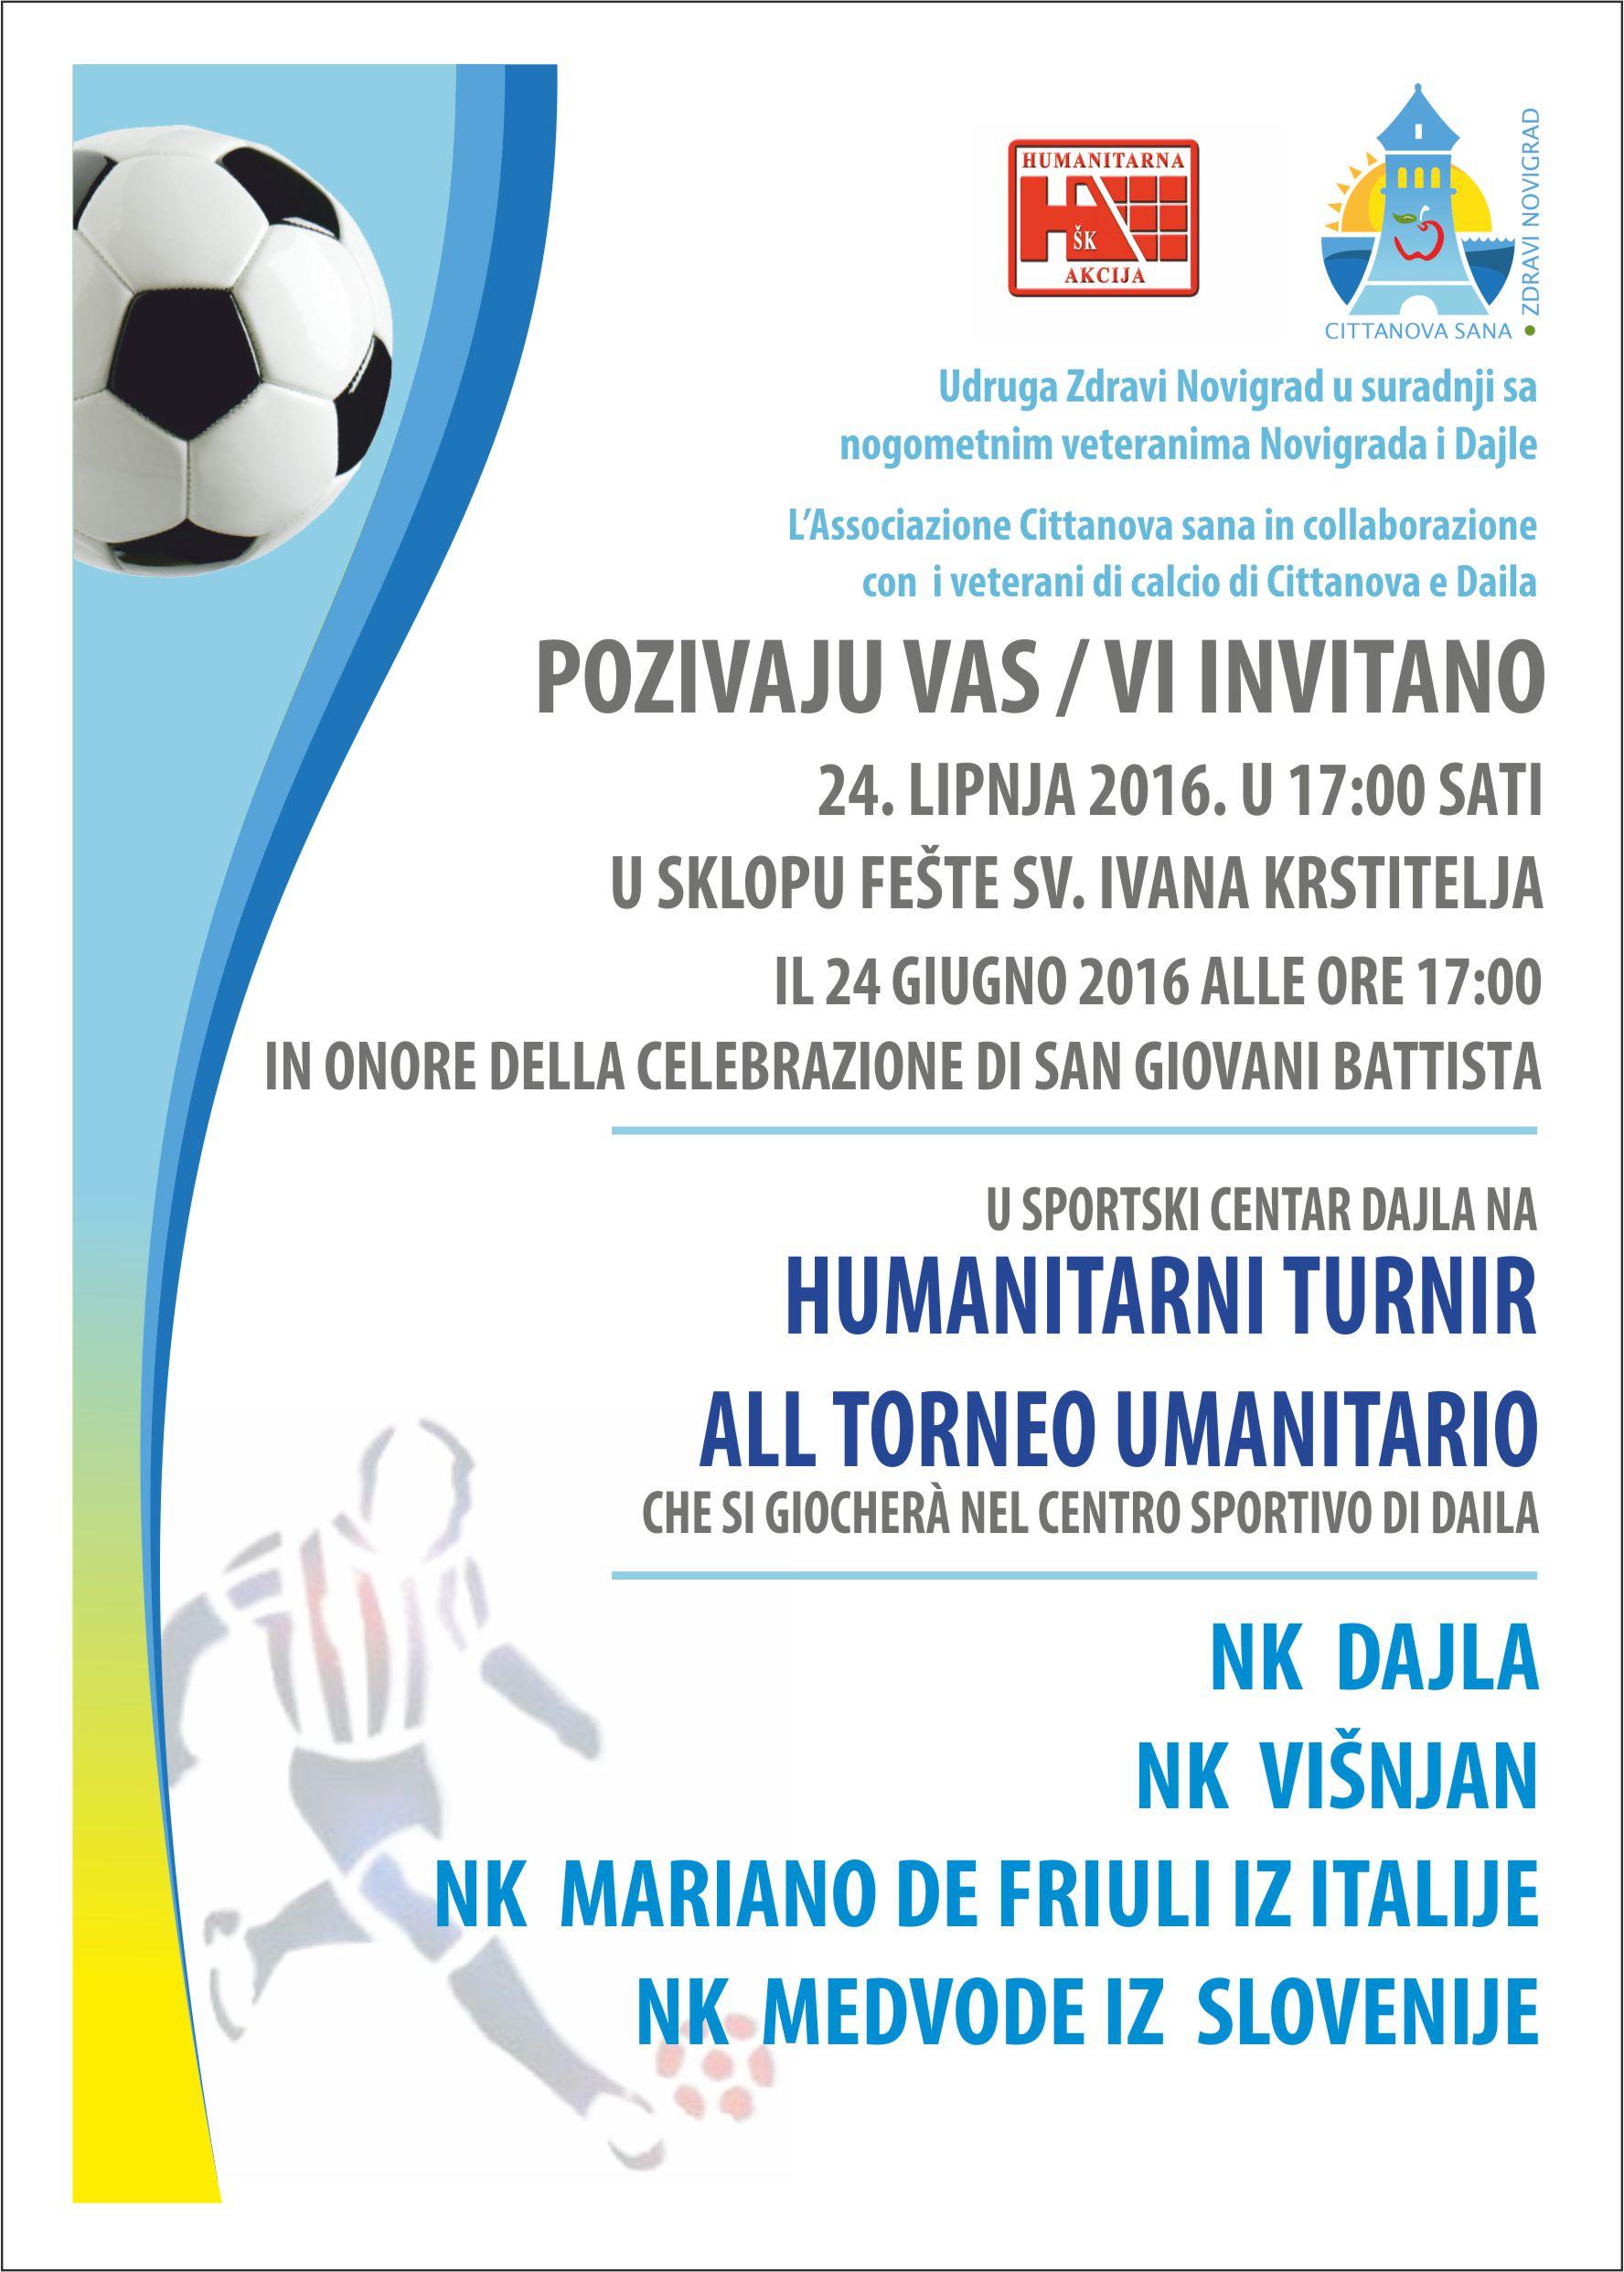 http://www.novigrad.hr/humanitarni_nogometni_turnir